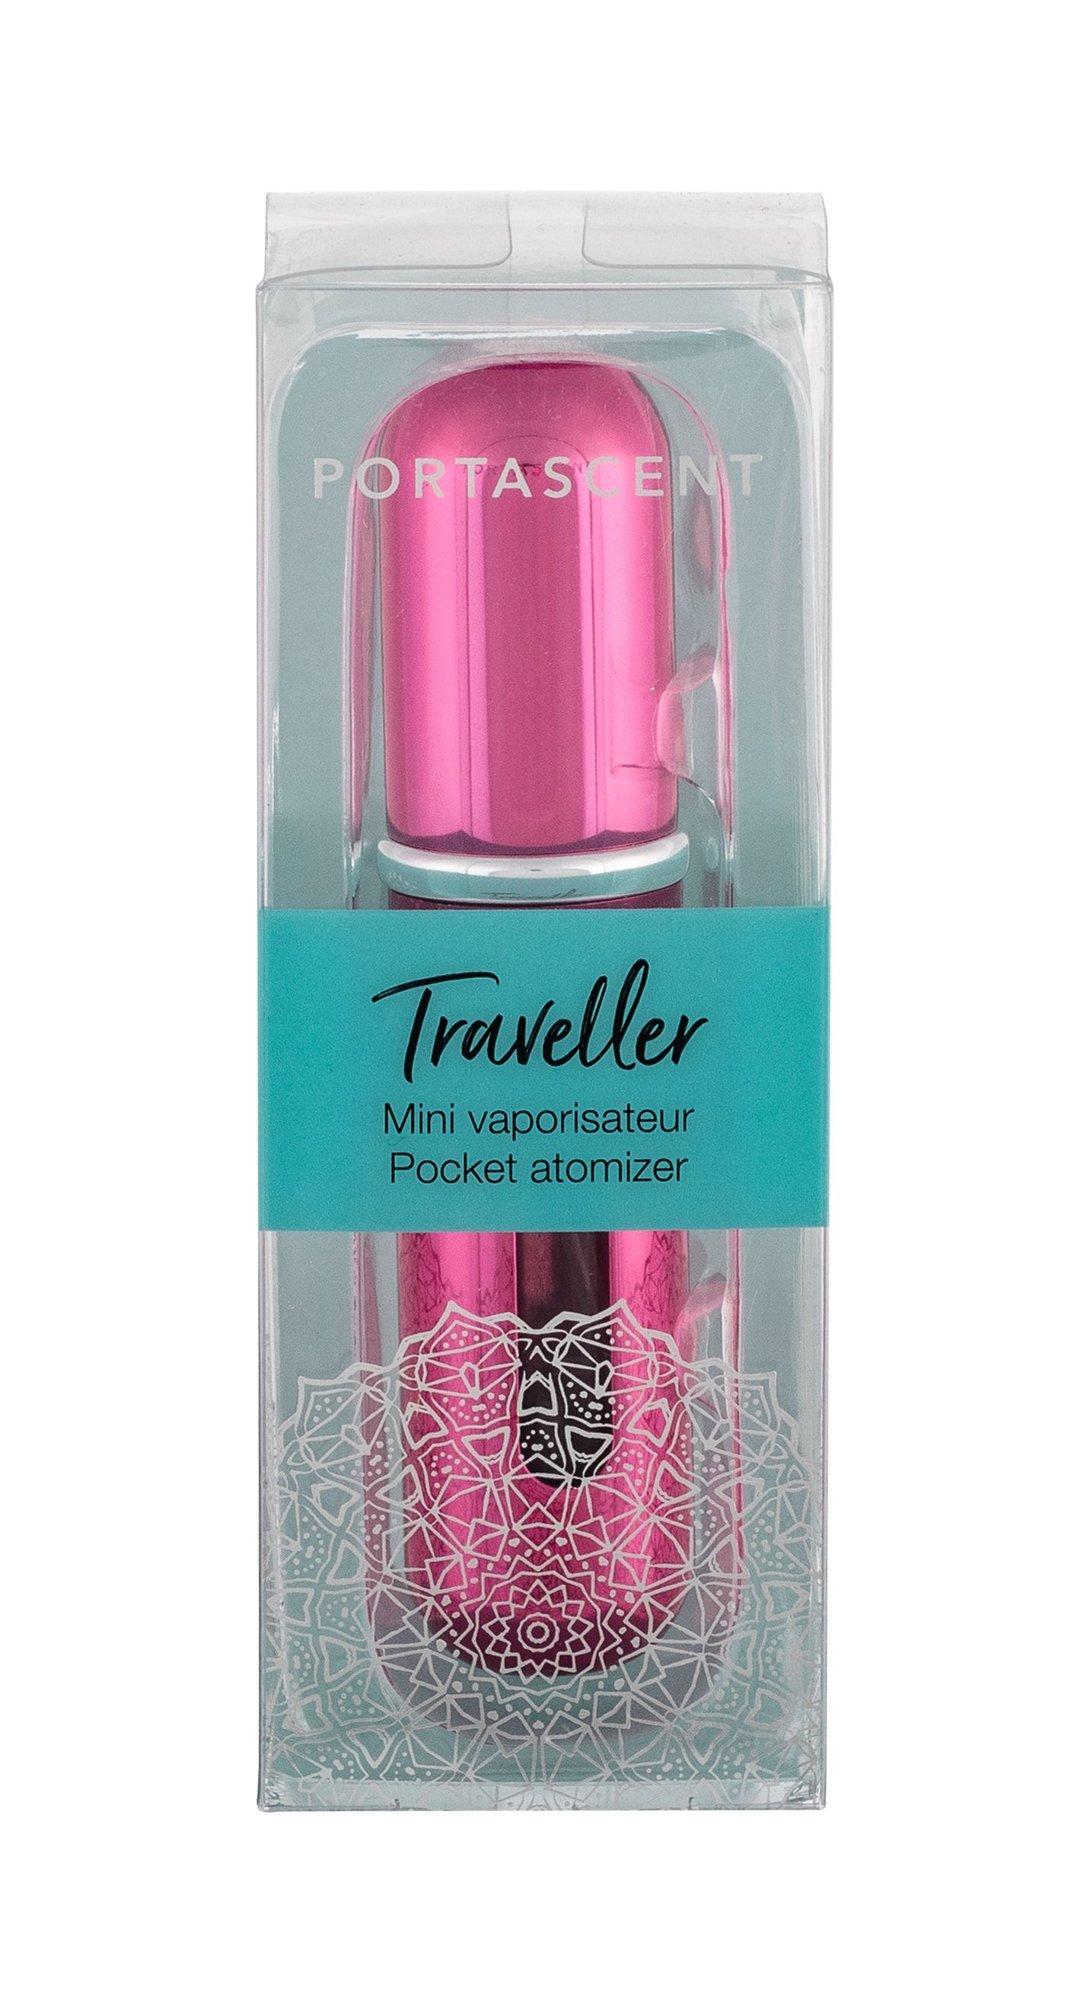 PortaScent Traveller Refillable 5ml Hot Pink